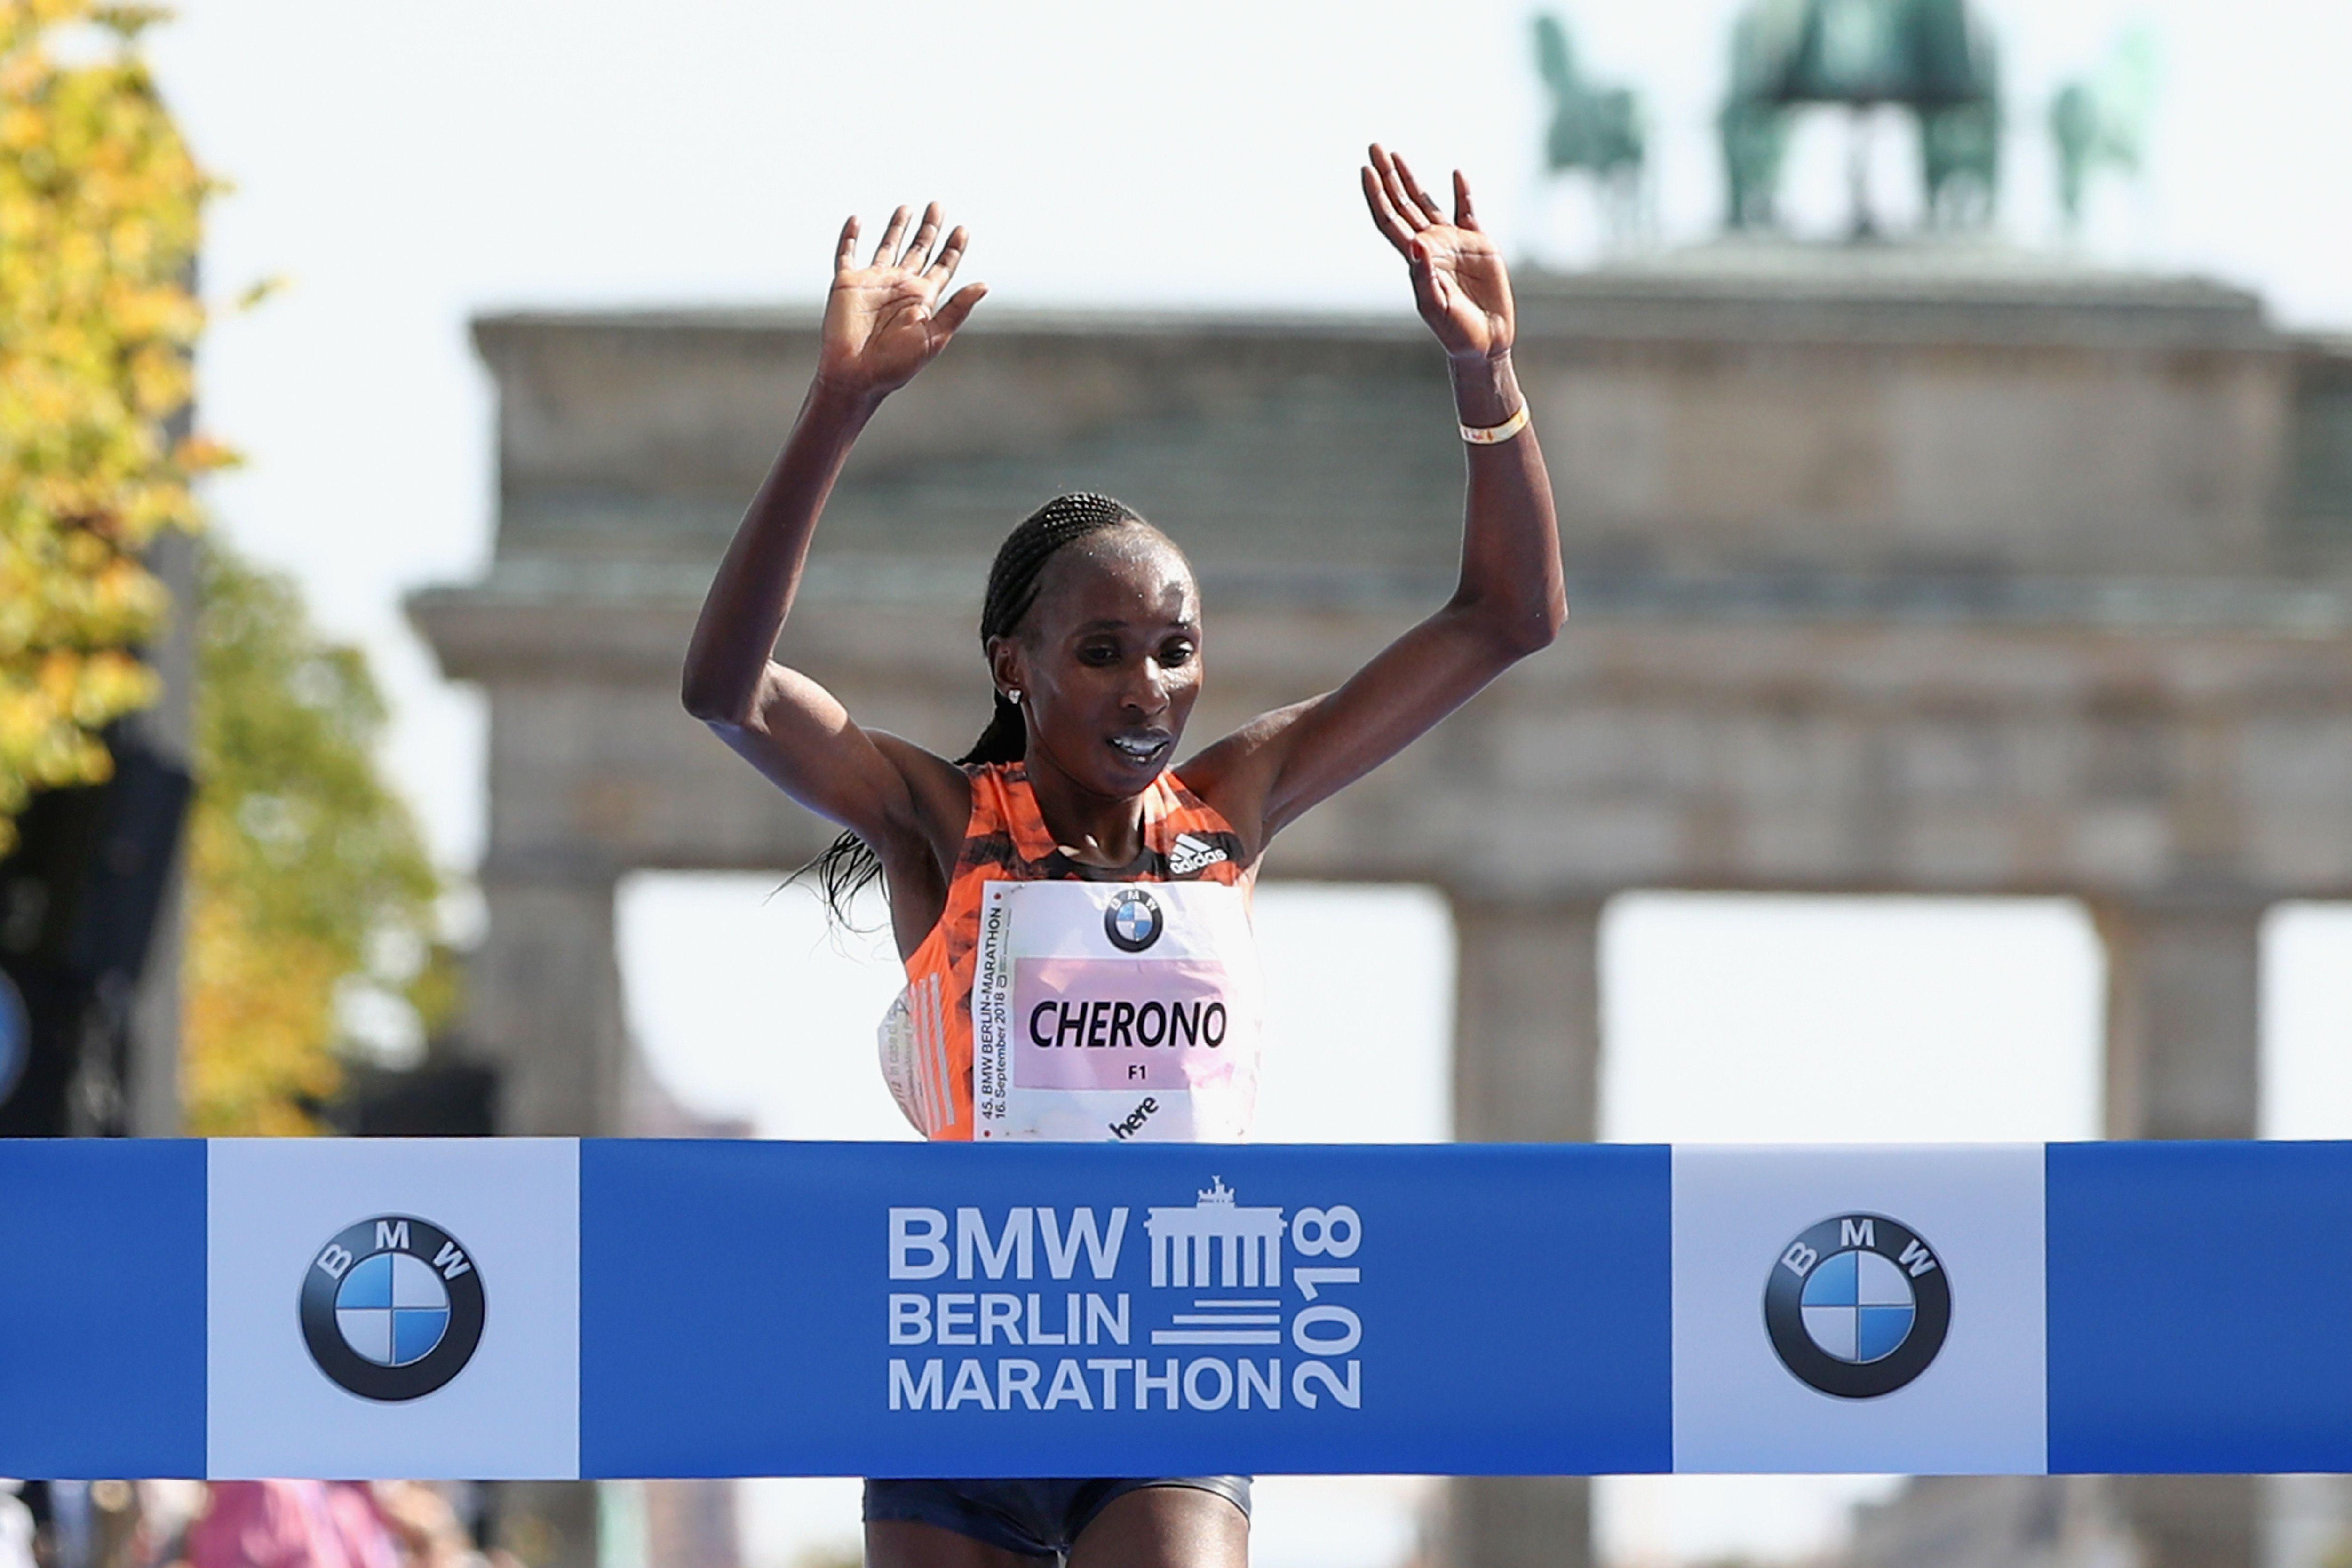 How to Watch the 2019 Berlin Marathon